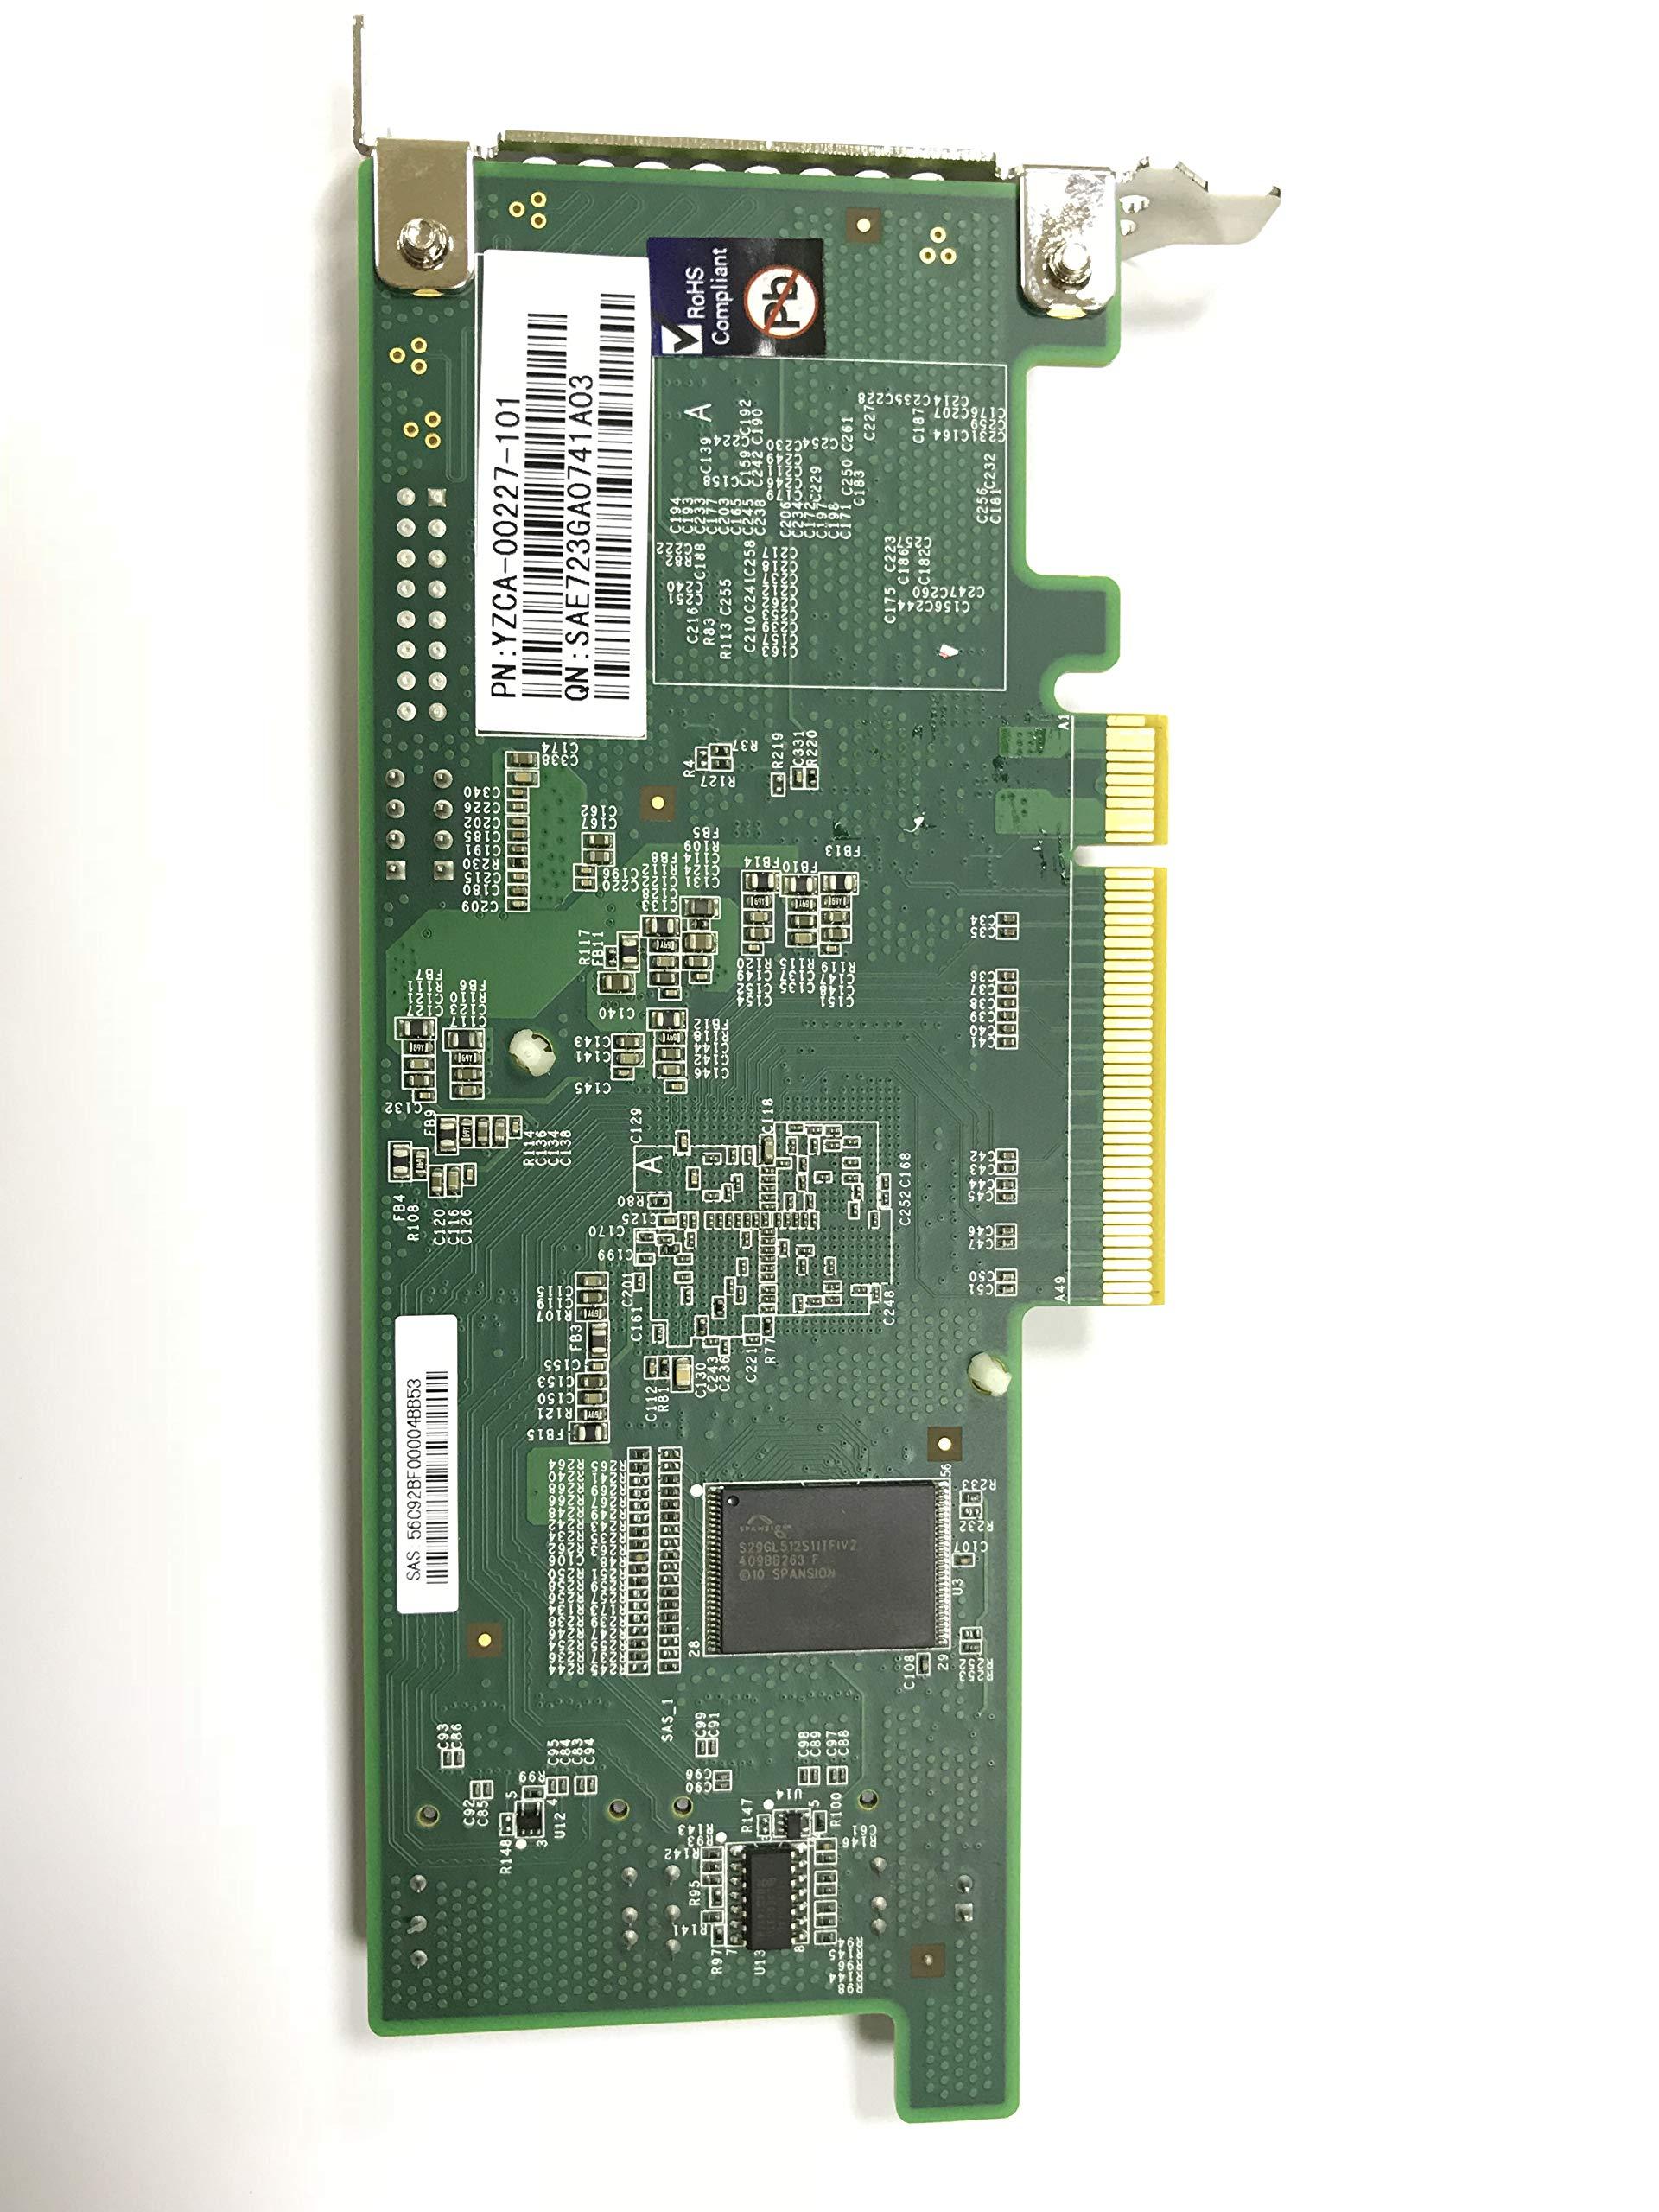 MFU SAS 9207-8i 8-Port 6Gb/s SAS+SATA to PCI Express 2.0 Host Bus Adapter by MFU (Image #2)